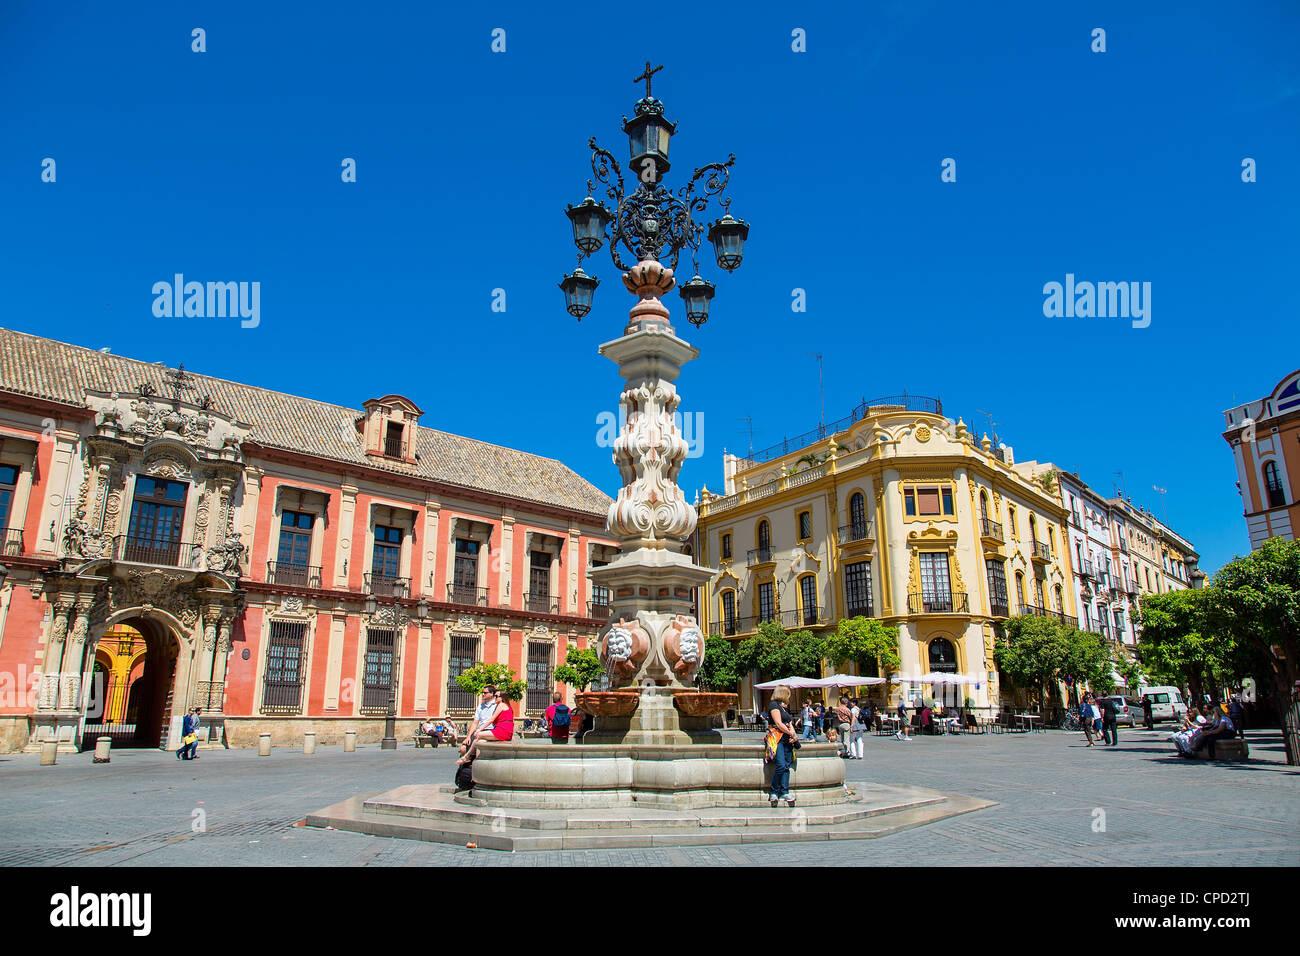 Europe, Spain Andalusia, Seville, Plaza Virgen de los Reyes - Stock Image